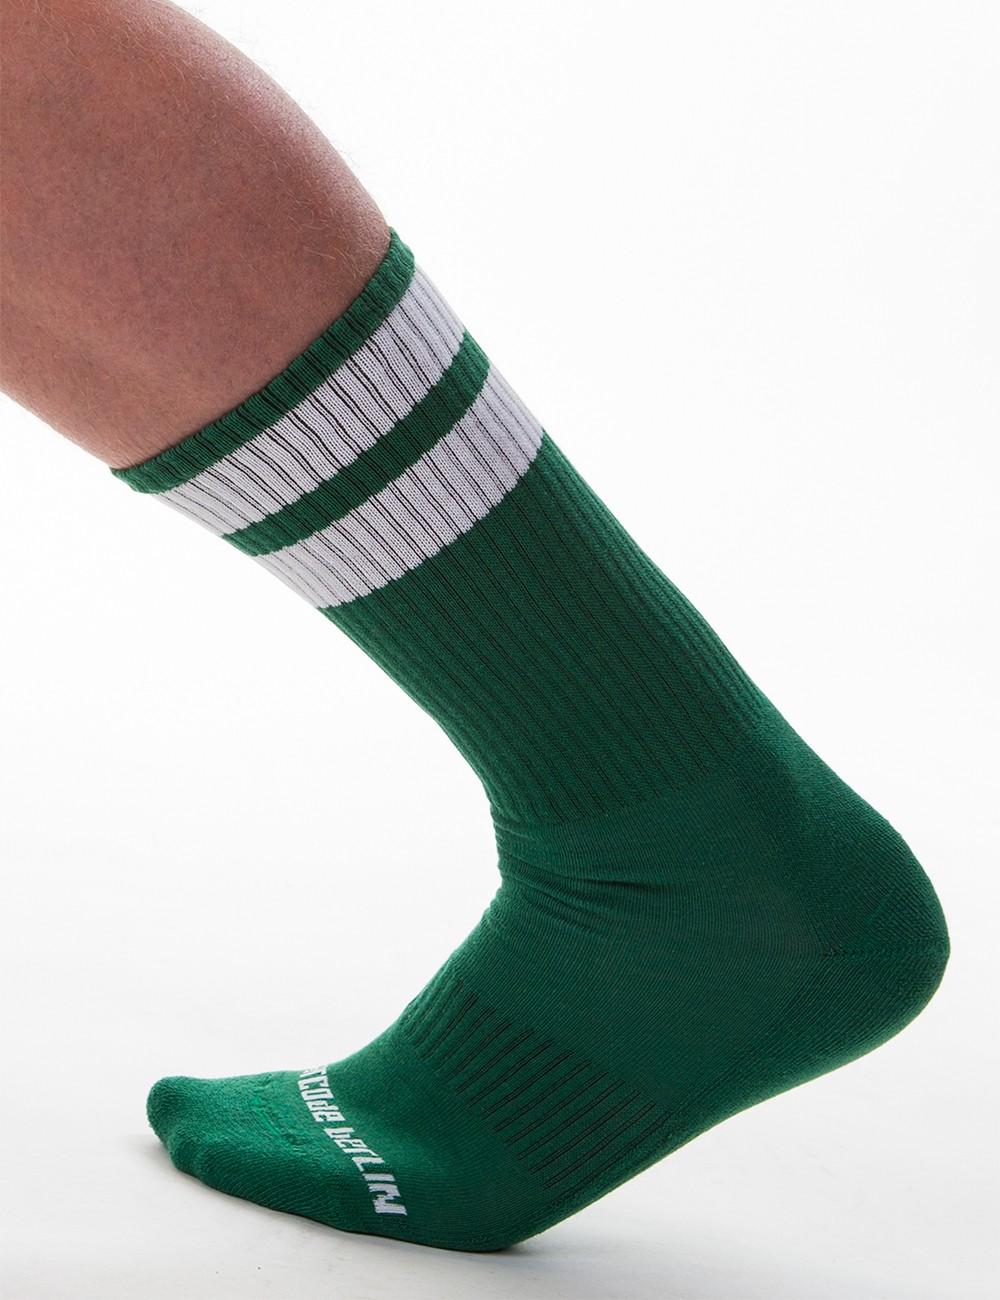 Gym Socks - Army-White